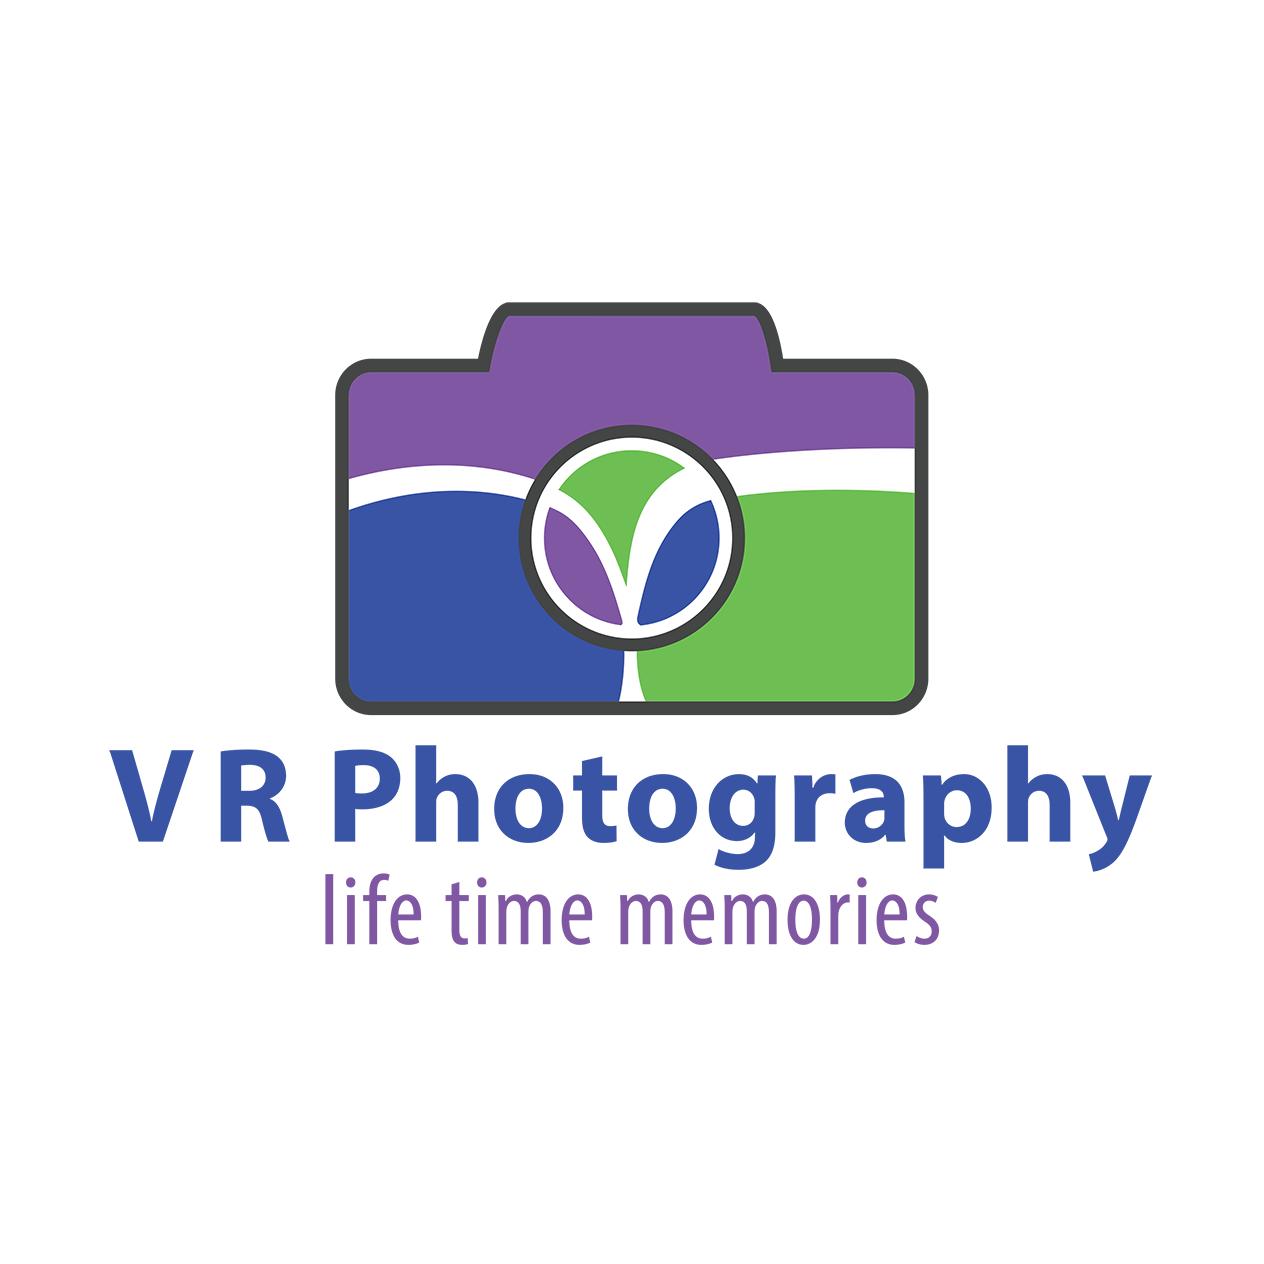 VR Photography, LLC floor plan in New Bern Raleigh